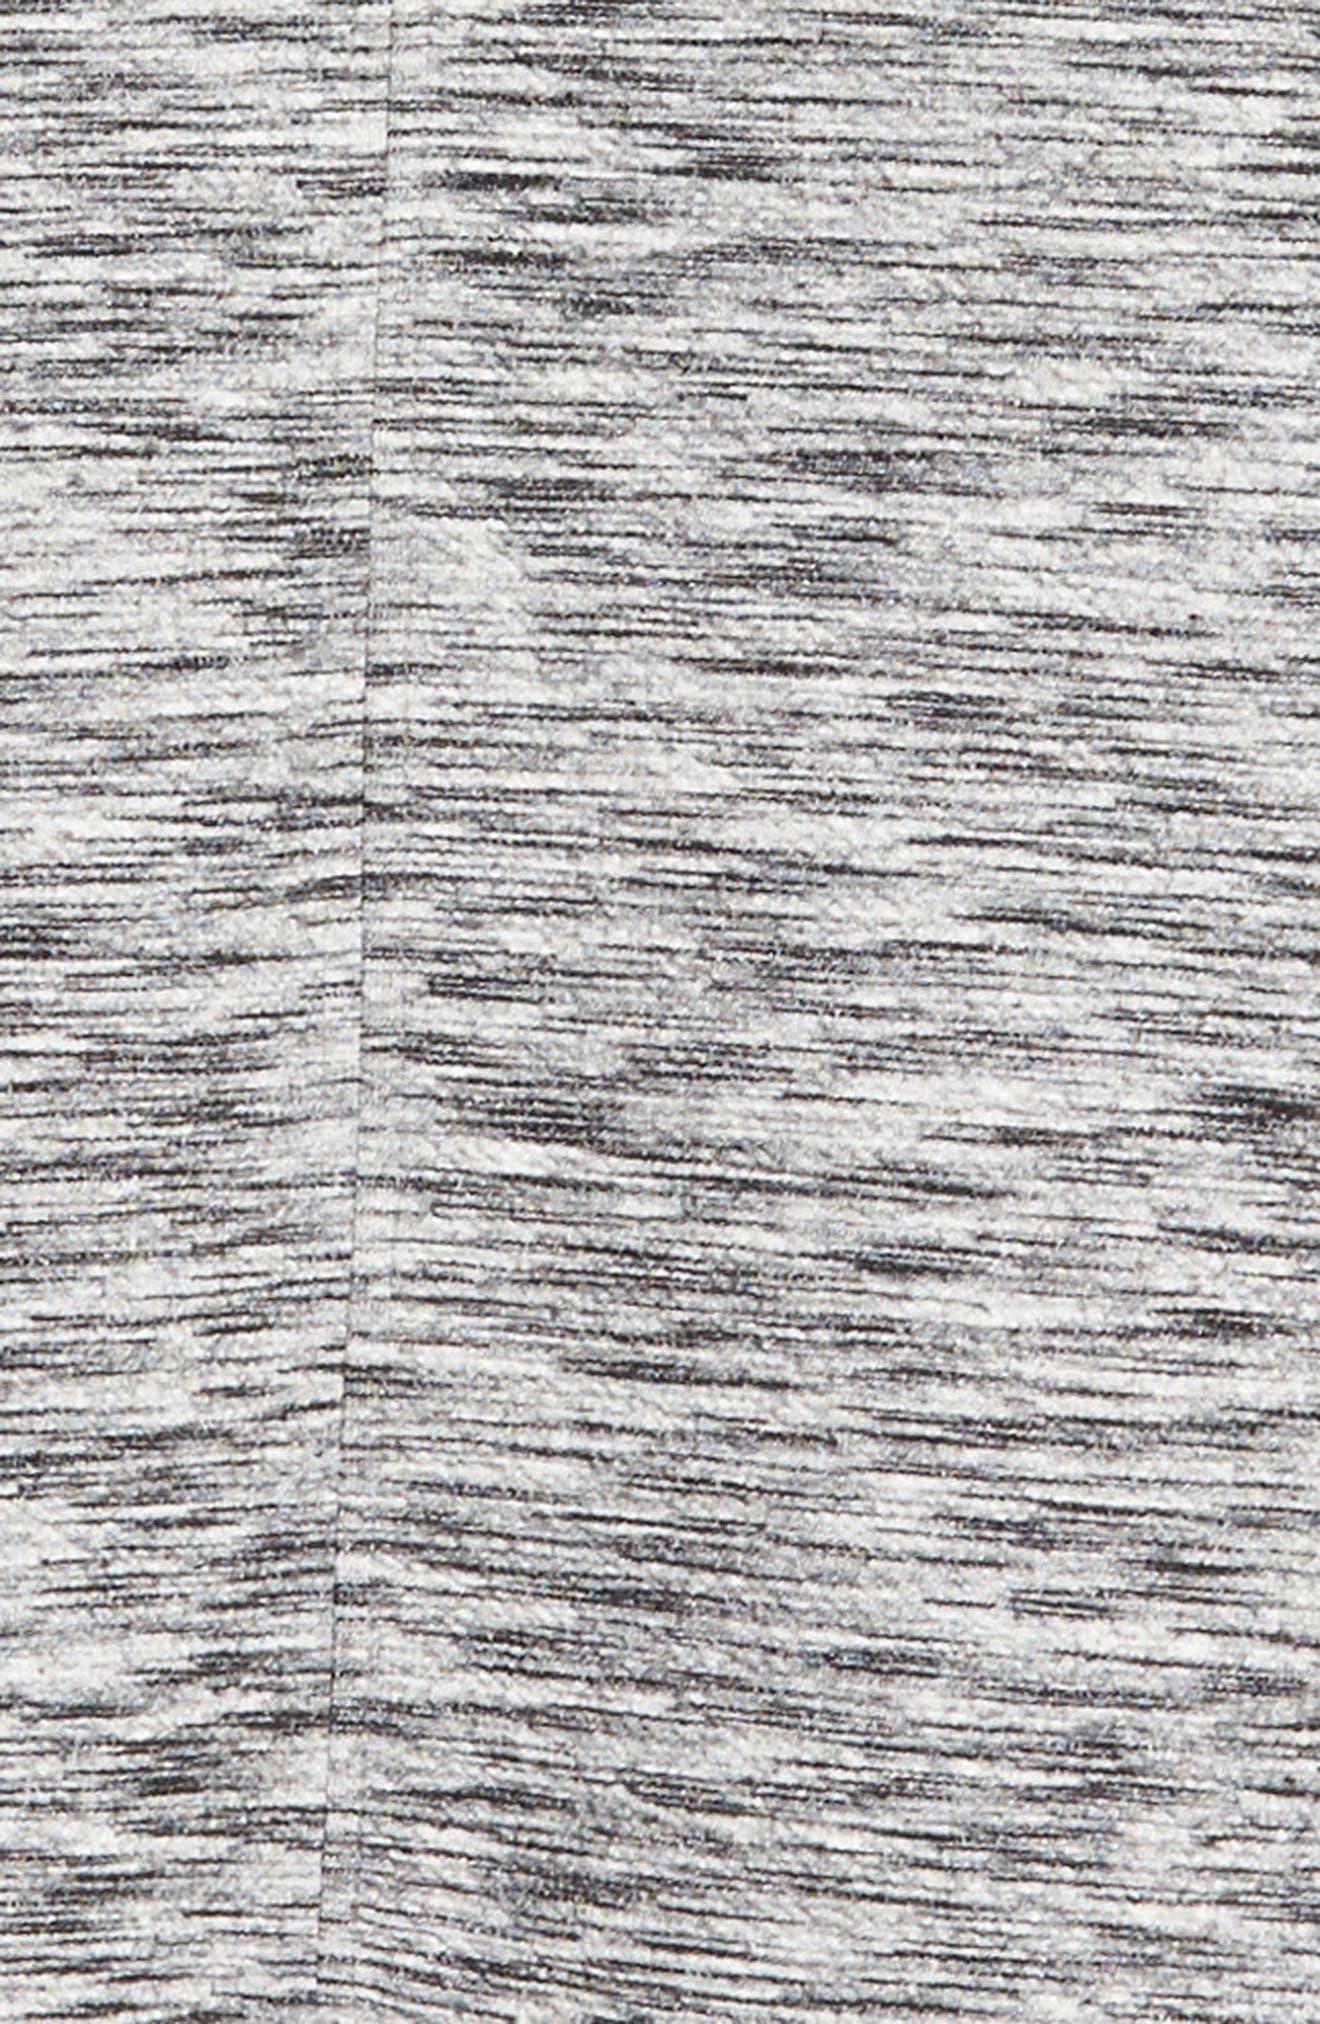 Knit Bomber Jacket,                             Alternate thumbnail 5, color,                             Grey Lunar Spacedye